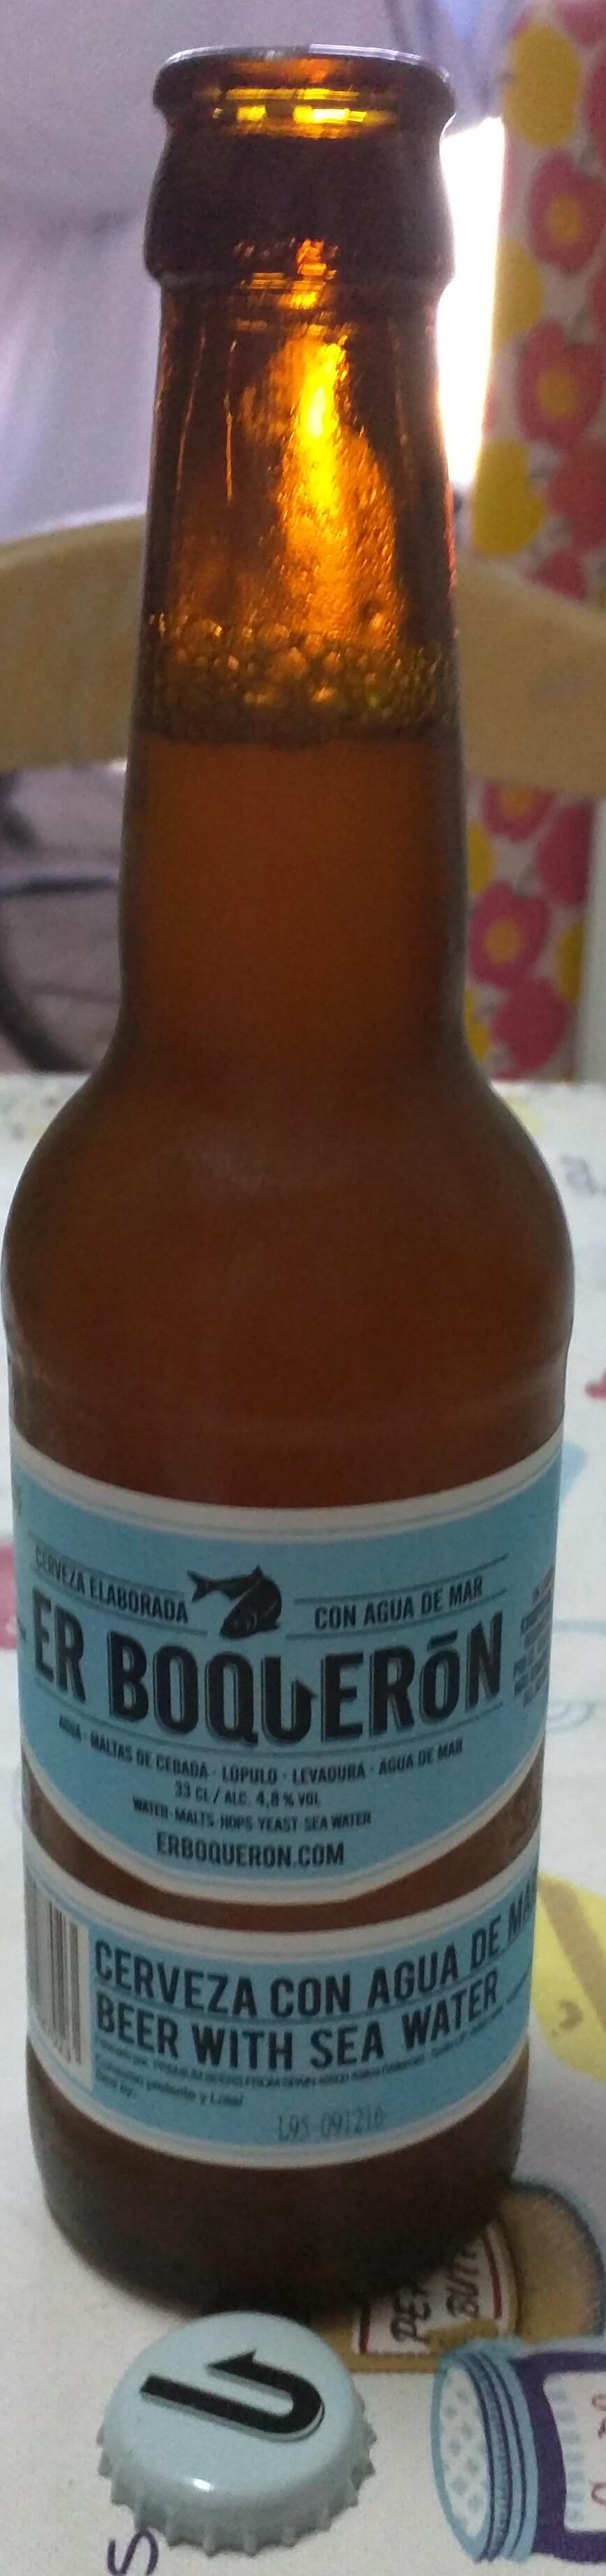 Cerveza Er Boquerón